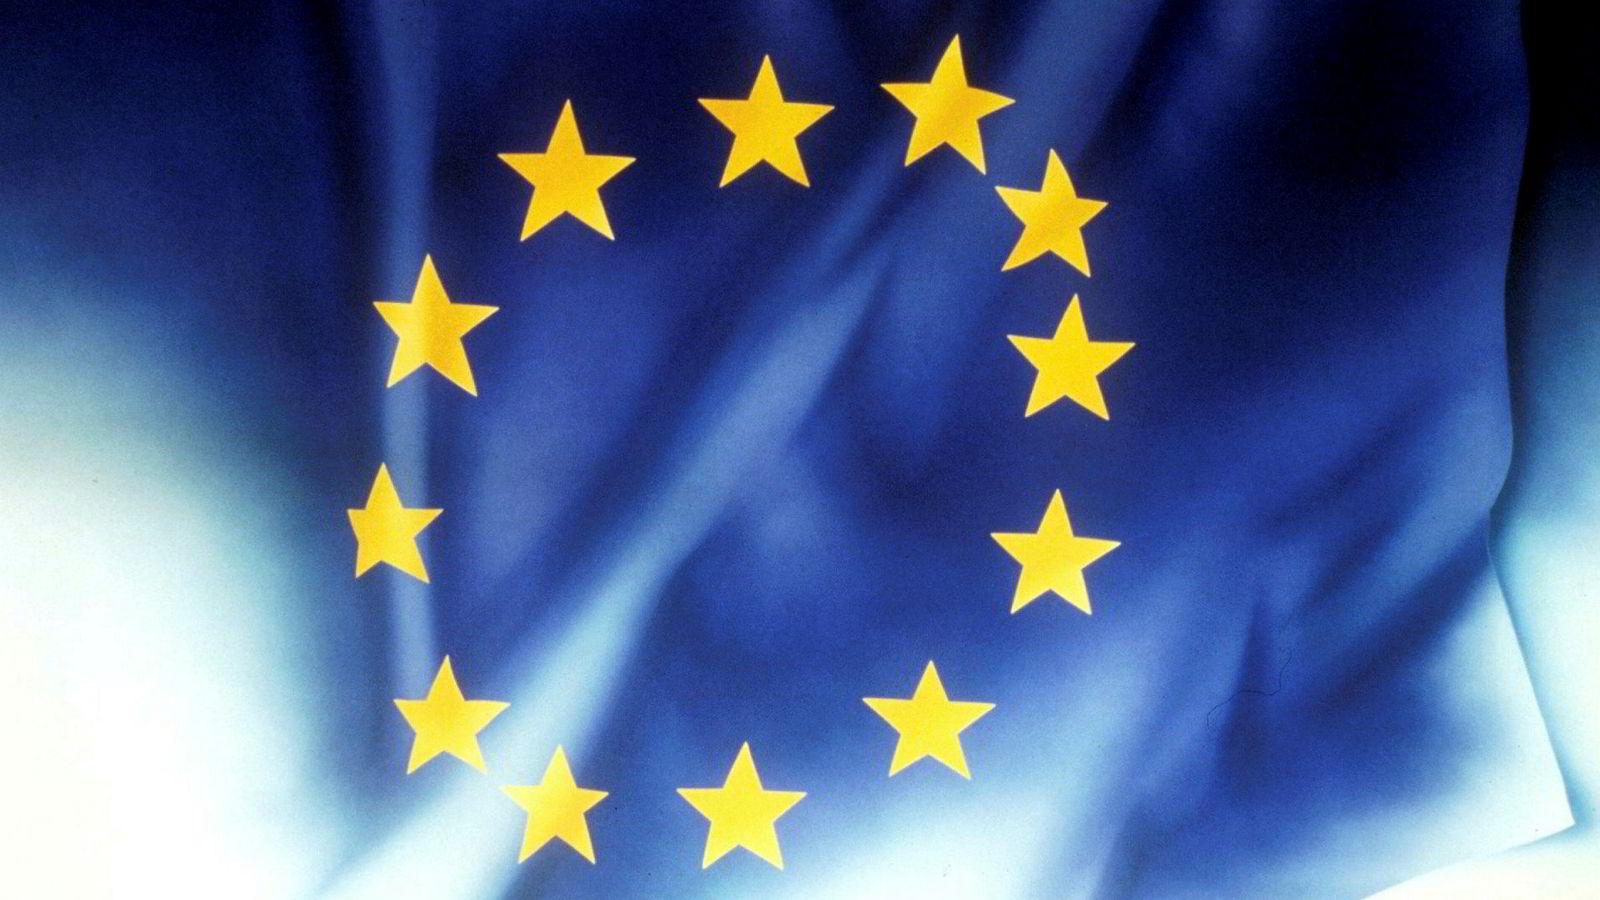 Det nystartede Brexit-partiet blir Storbritannias største i EU-valget.